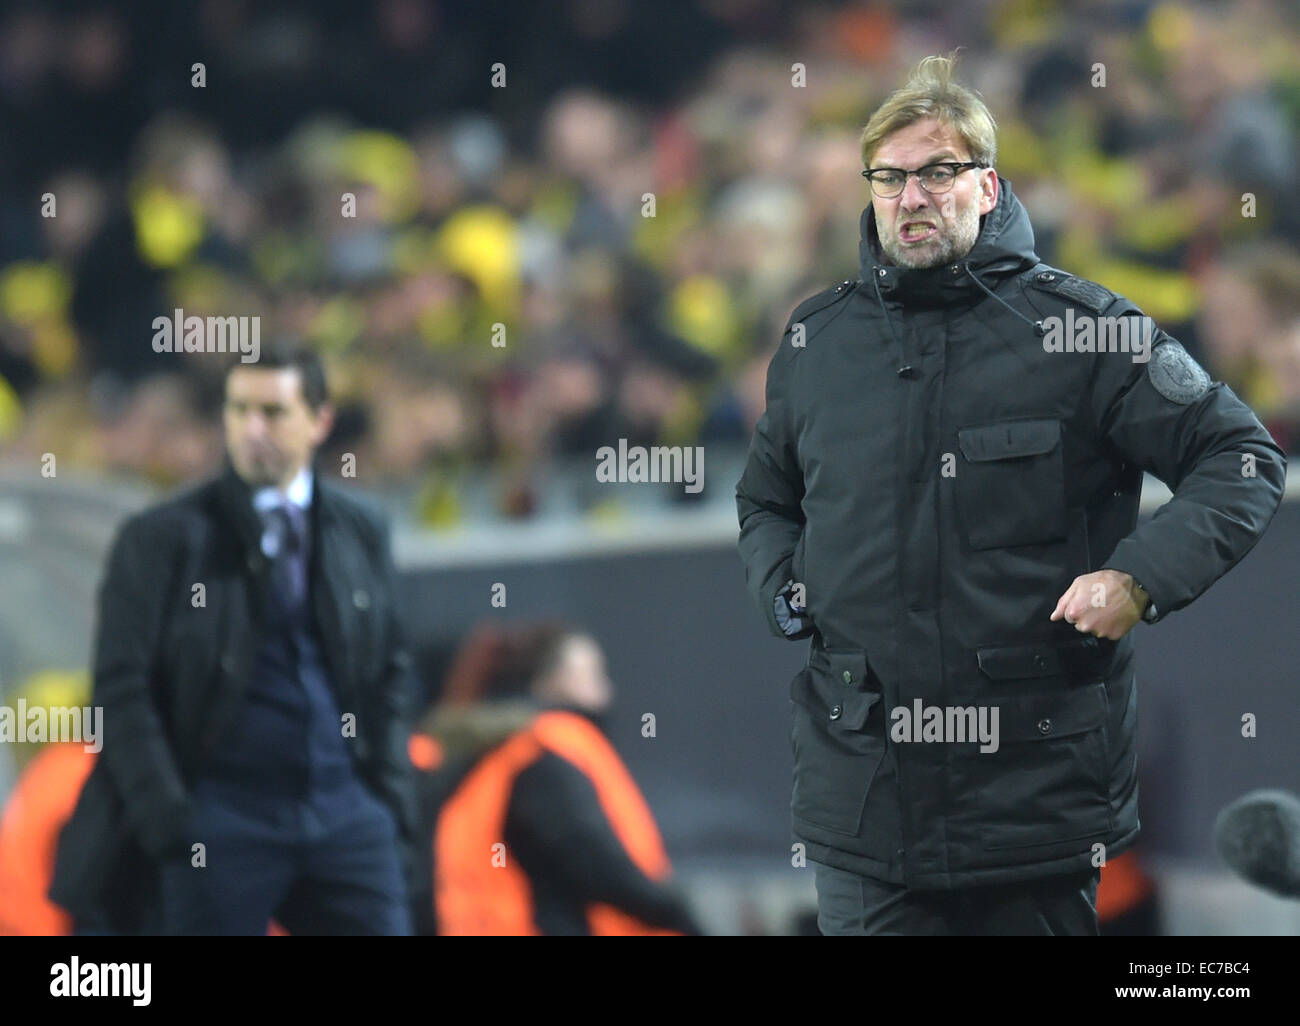 Dortmund's trainer Juergen Klopp during the Champions League Group D football match between BorussiaDortmund - Stock Image